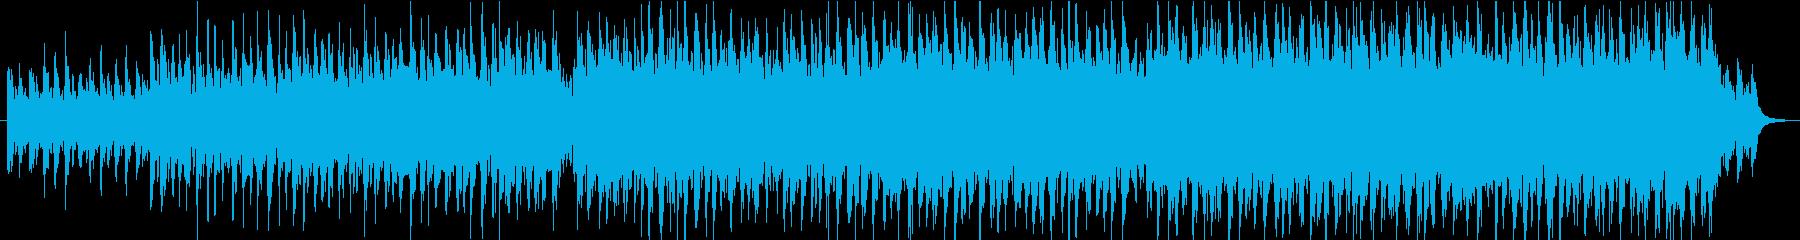 Epic感のあるミニマル室内楽の再生済みの波形